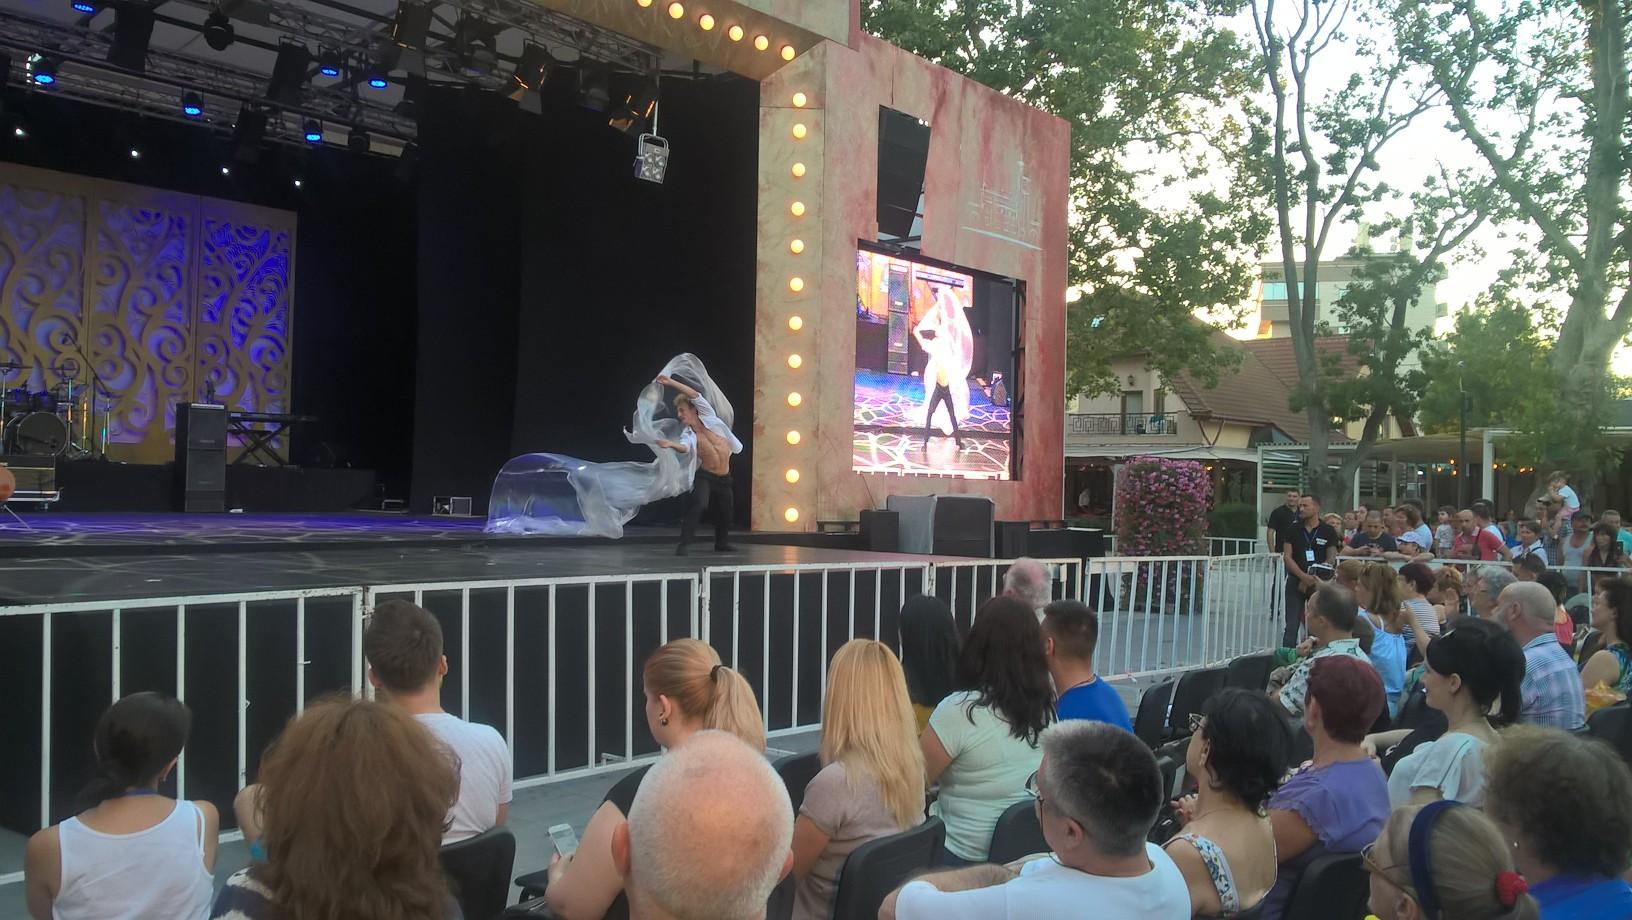 festivalul verii carusel cooltural4